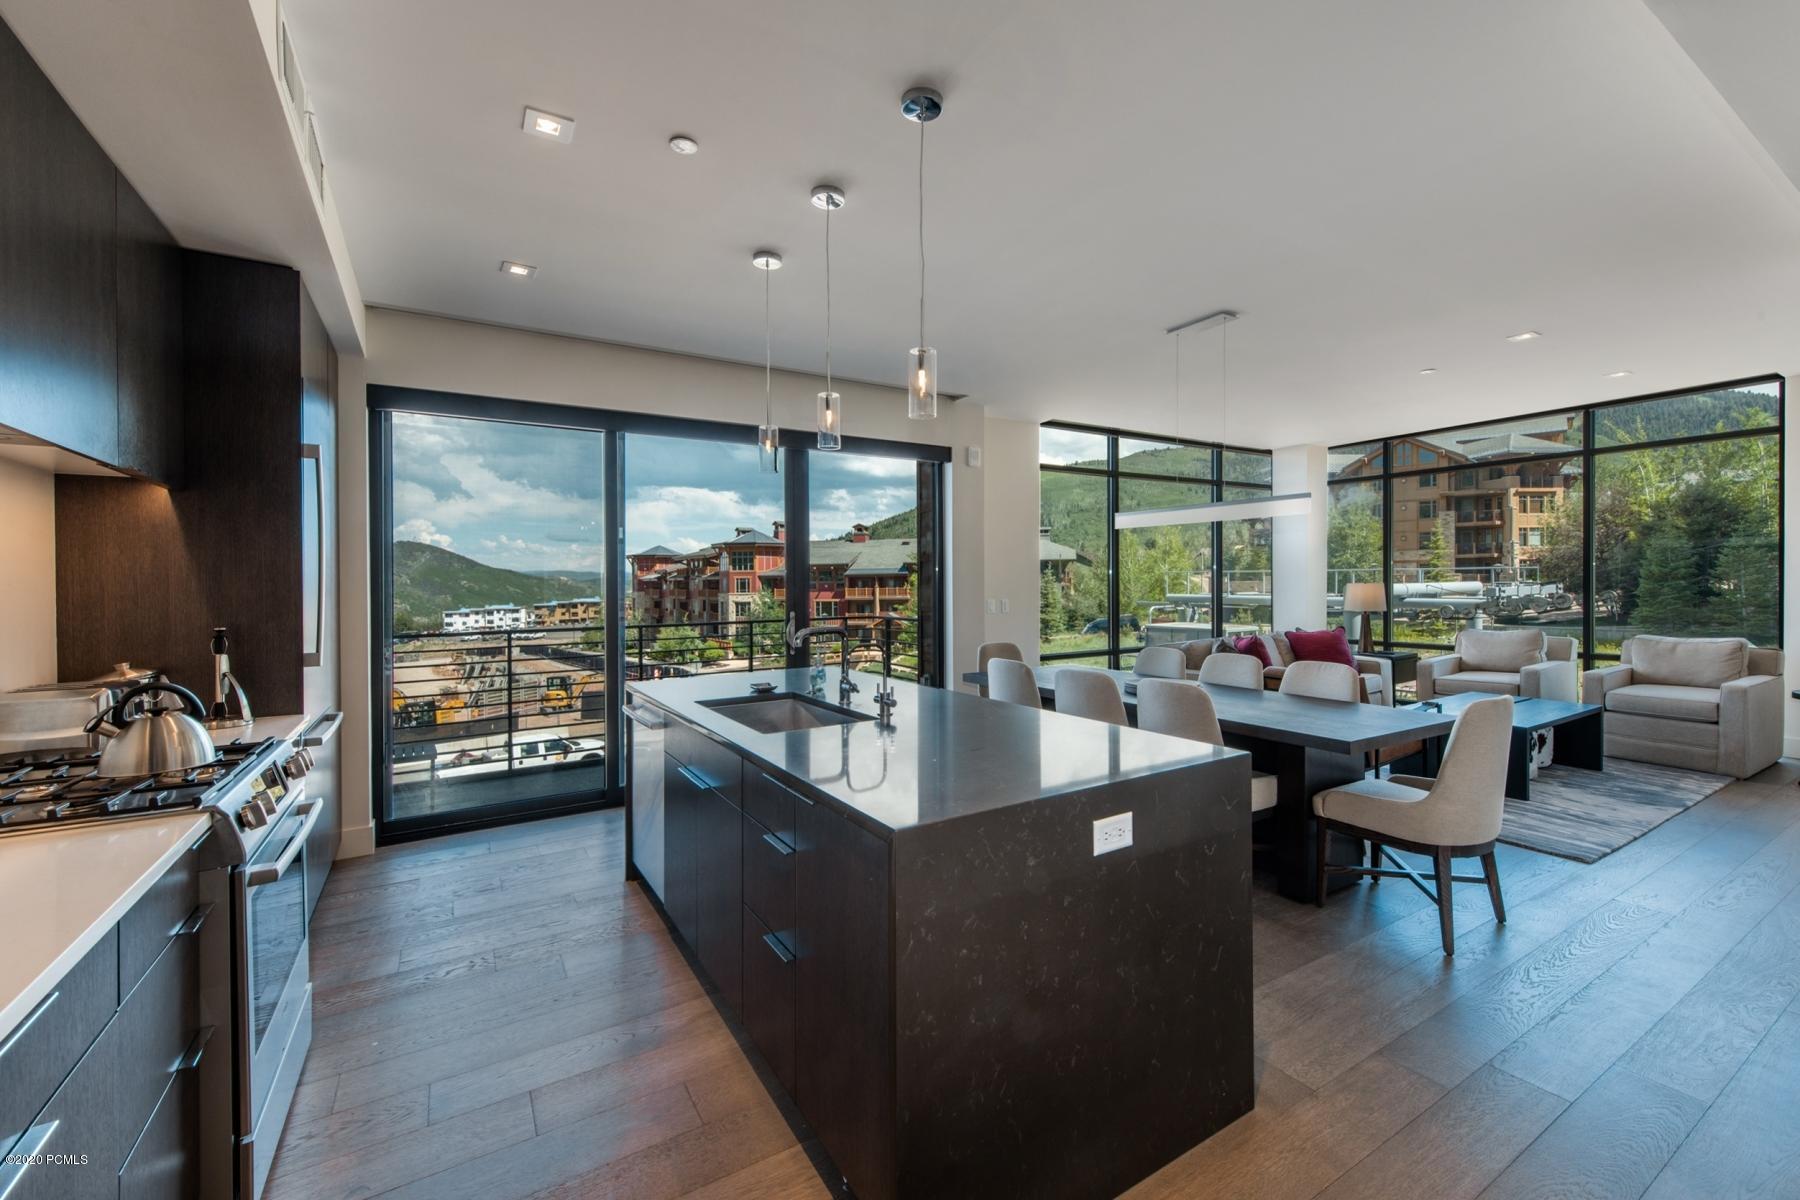 2431 High Mountain Road, Park City, Utah 84098, 3 Bedrooms Bedrooms, ,4 BathroomsBathrooms,Condominium,For Sale,High Mountain,20190109112430415765000000